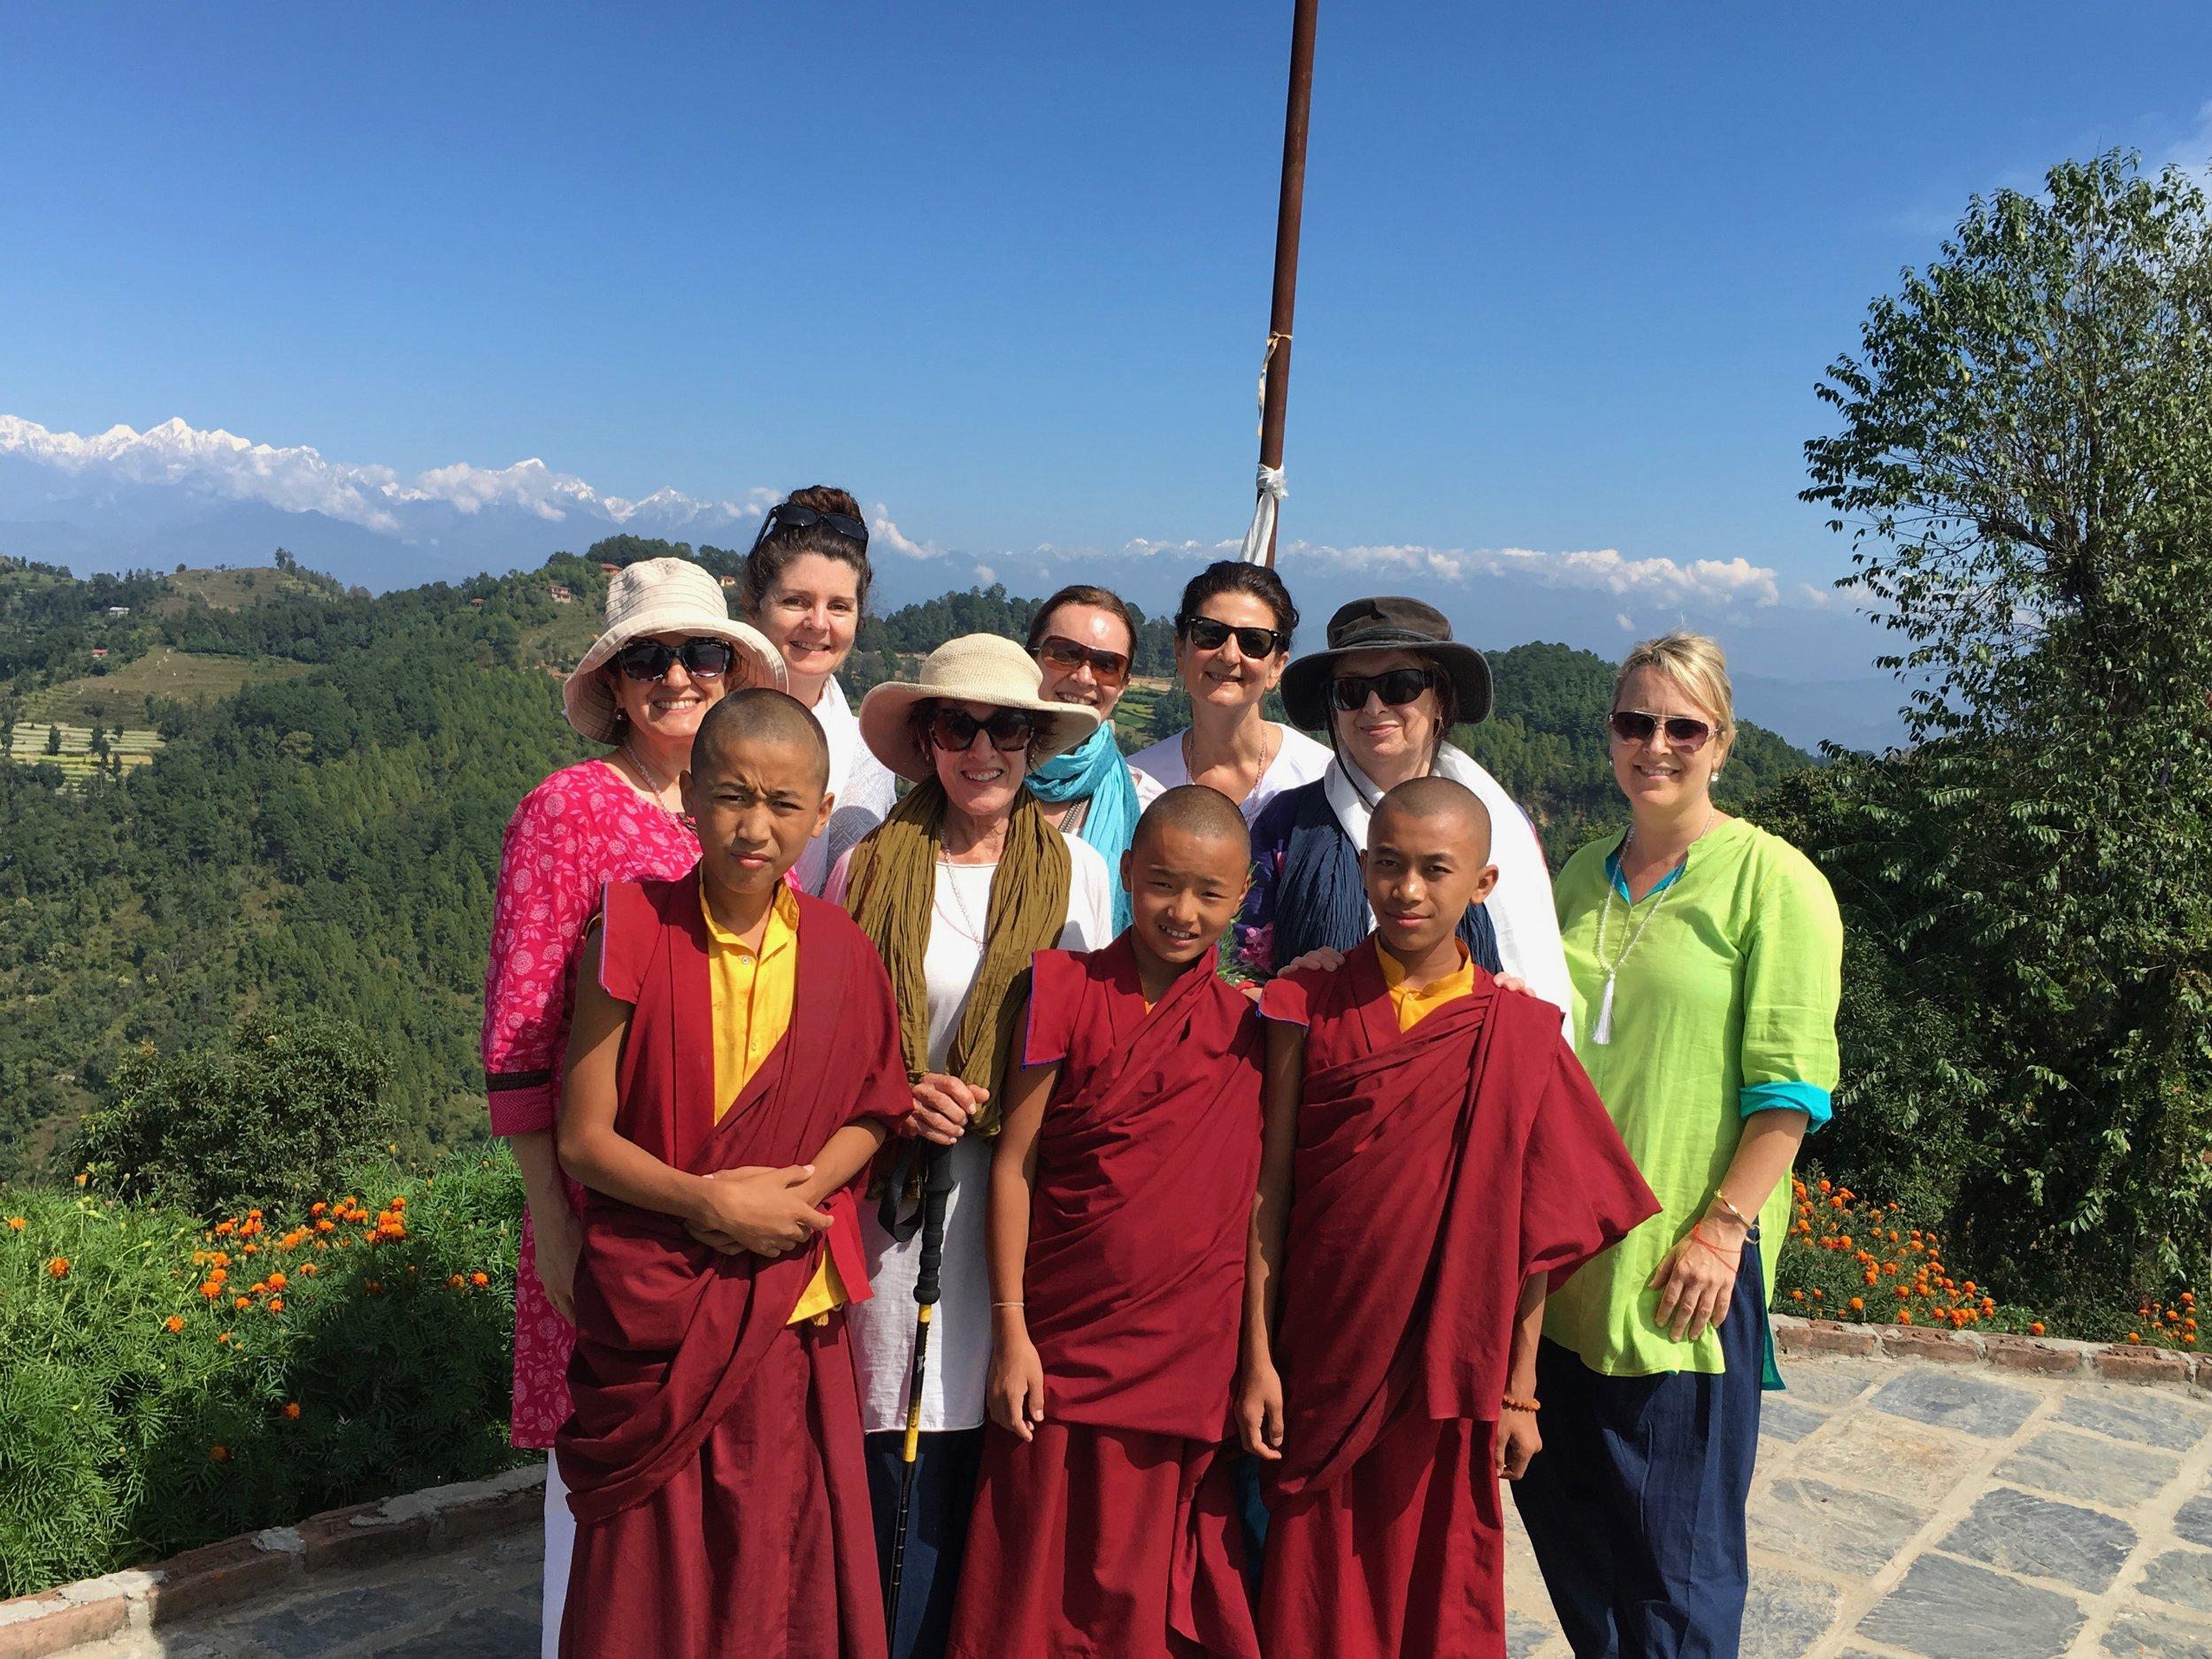 Namobuddhagroup and monks.jpg